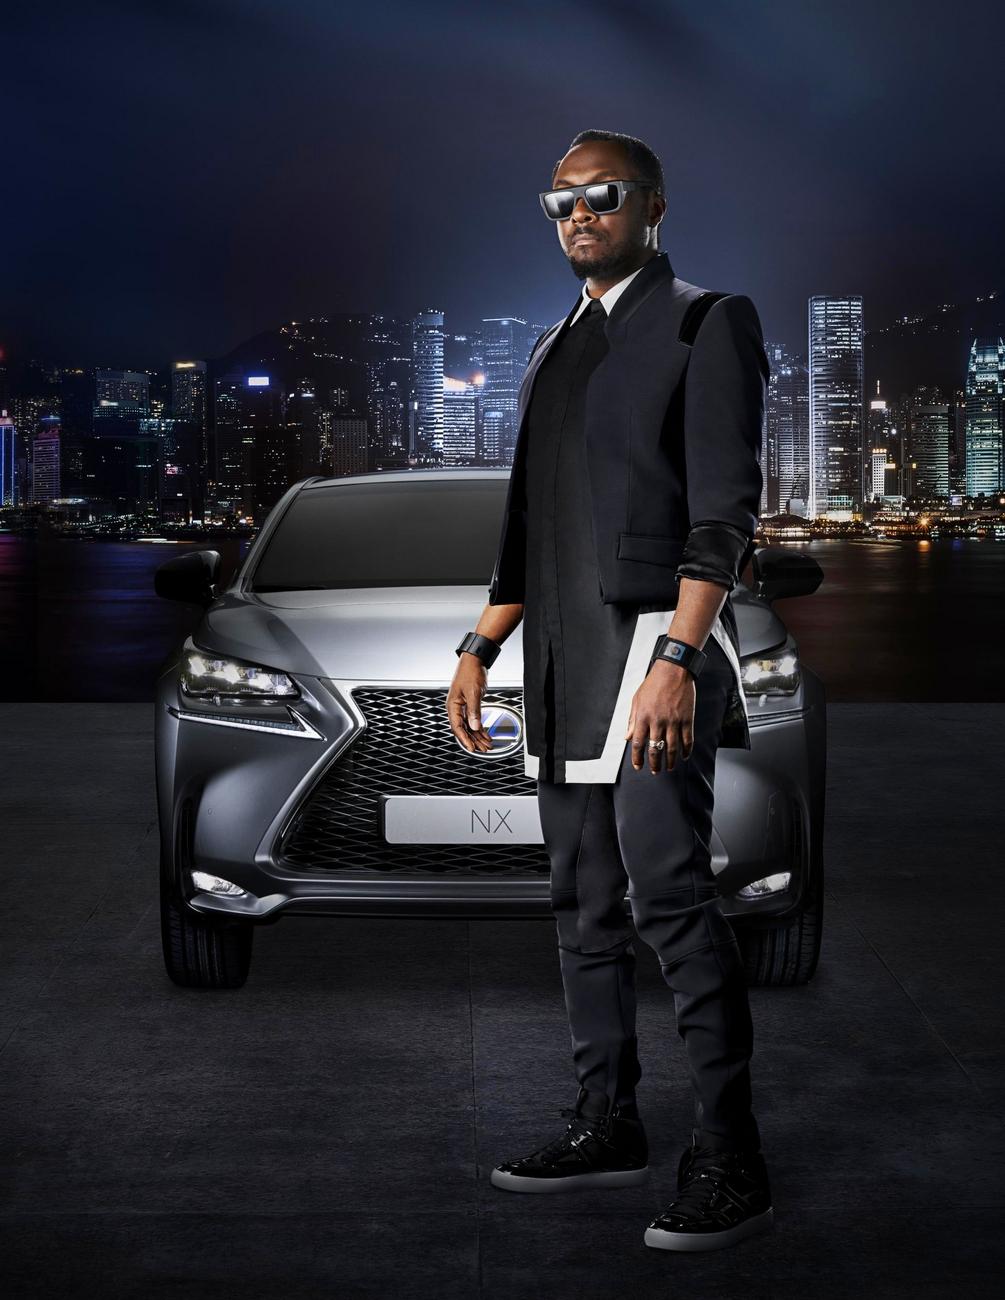 Lexus NX et Will